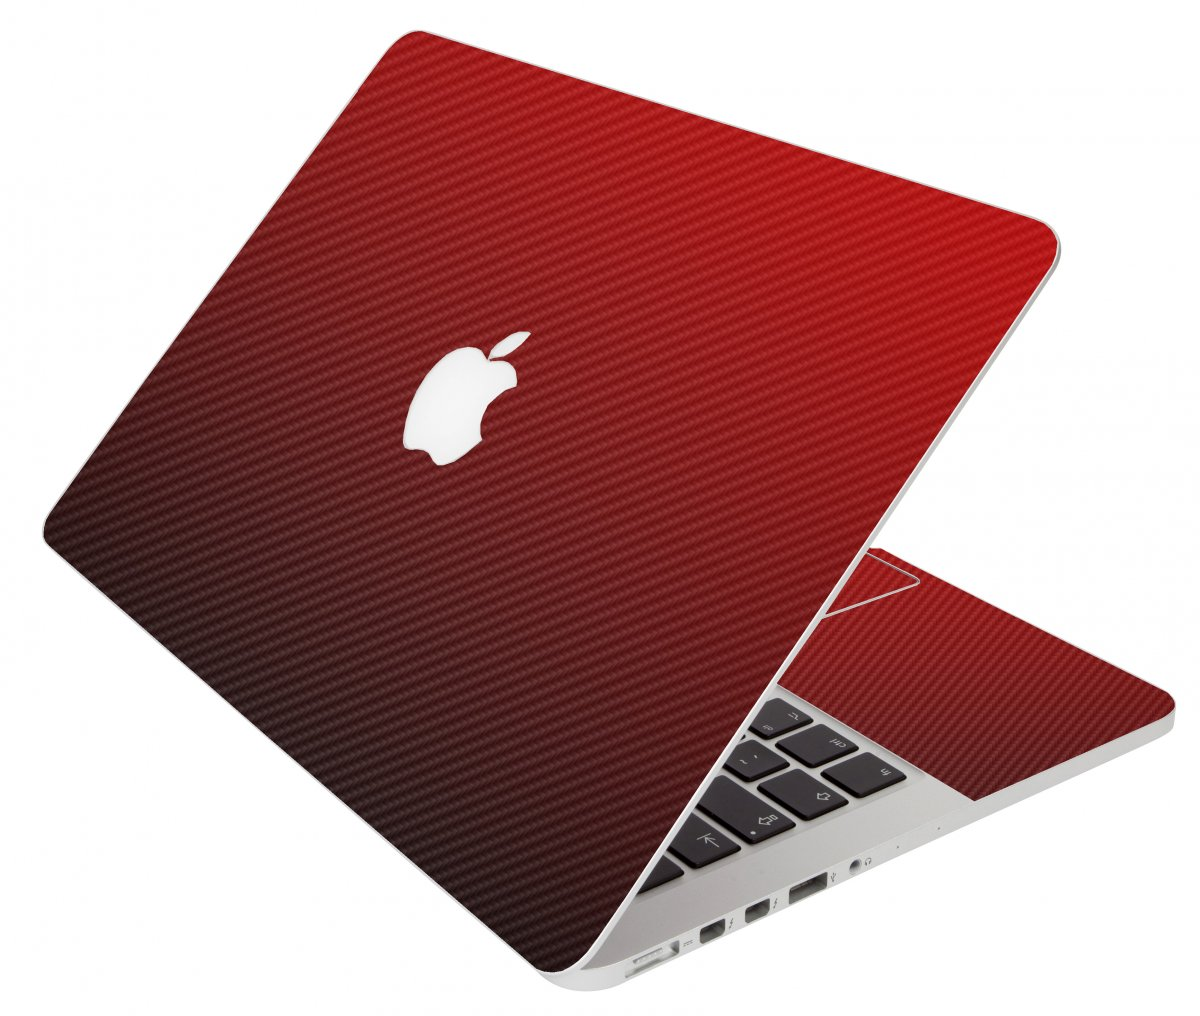 Red Carbon Fiber Apple Macbook Pro 17 A1297 Laptop  Skin